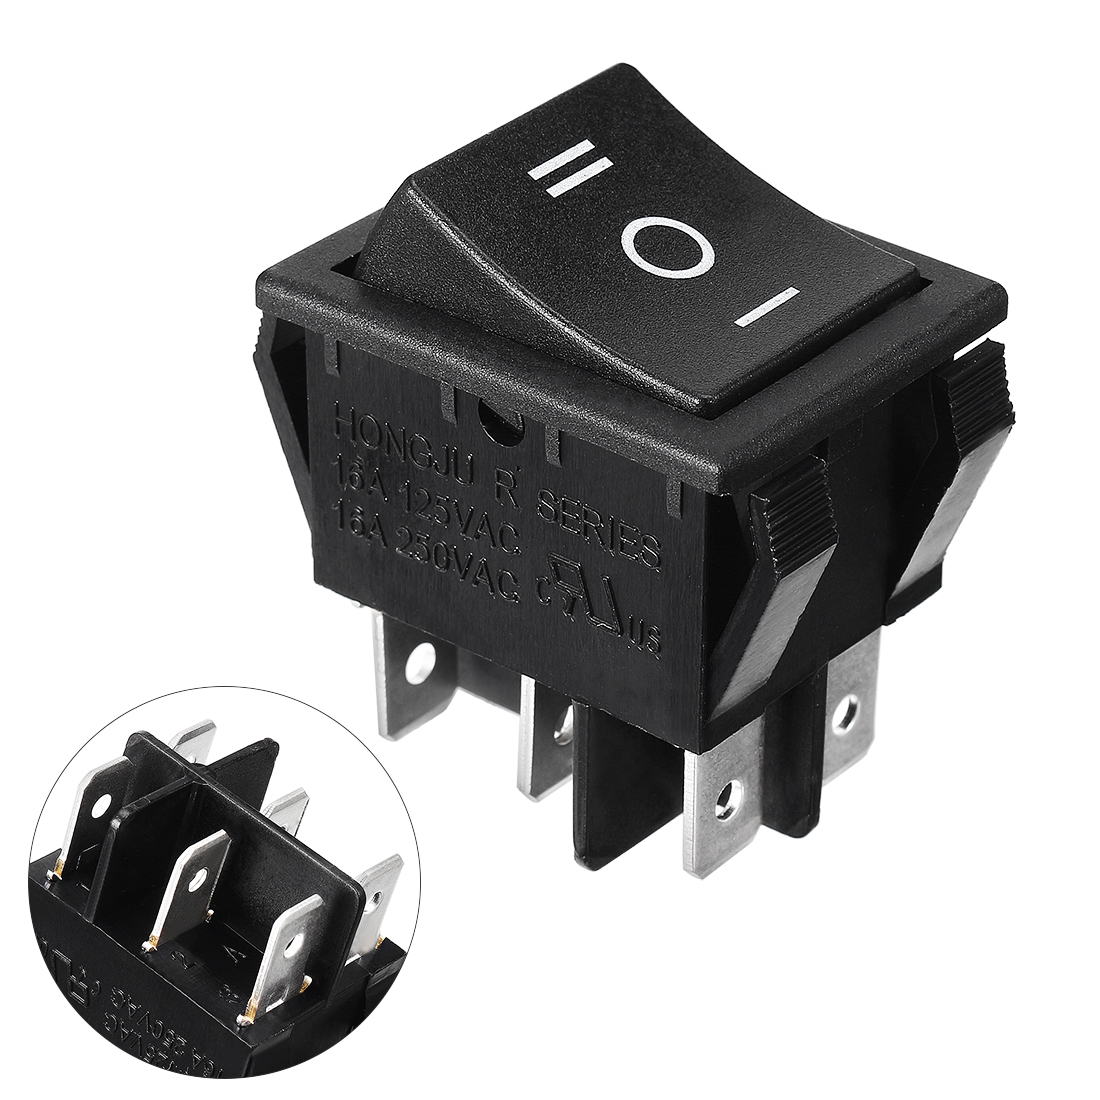 Black AC 250V/16A DPDT ON-OFF-ON 6 Pin Rocker Switch